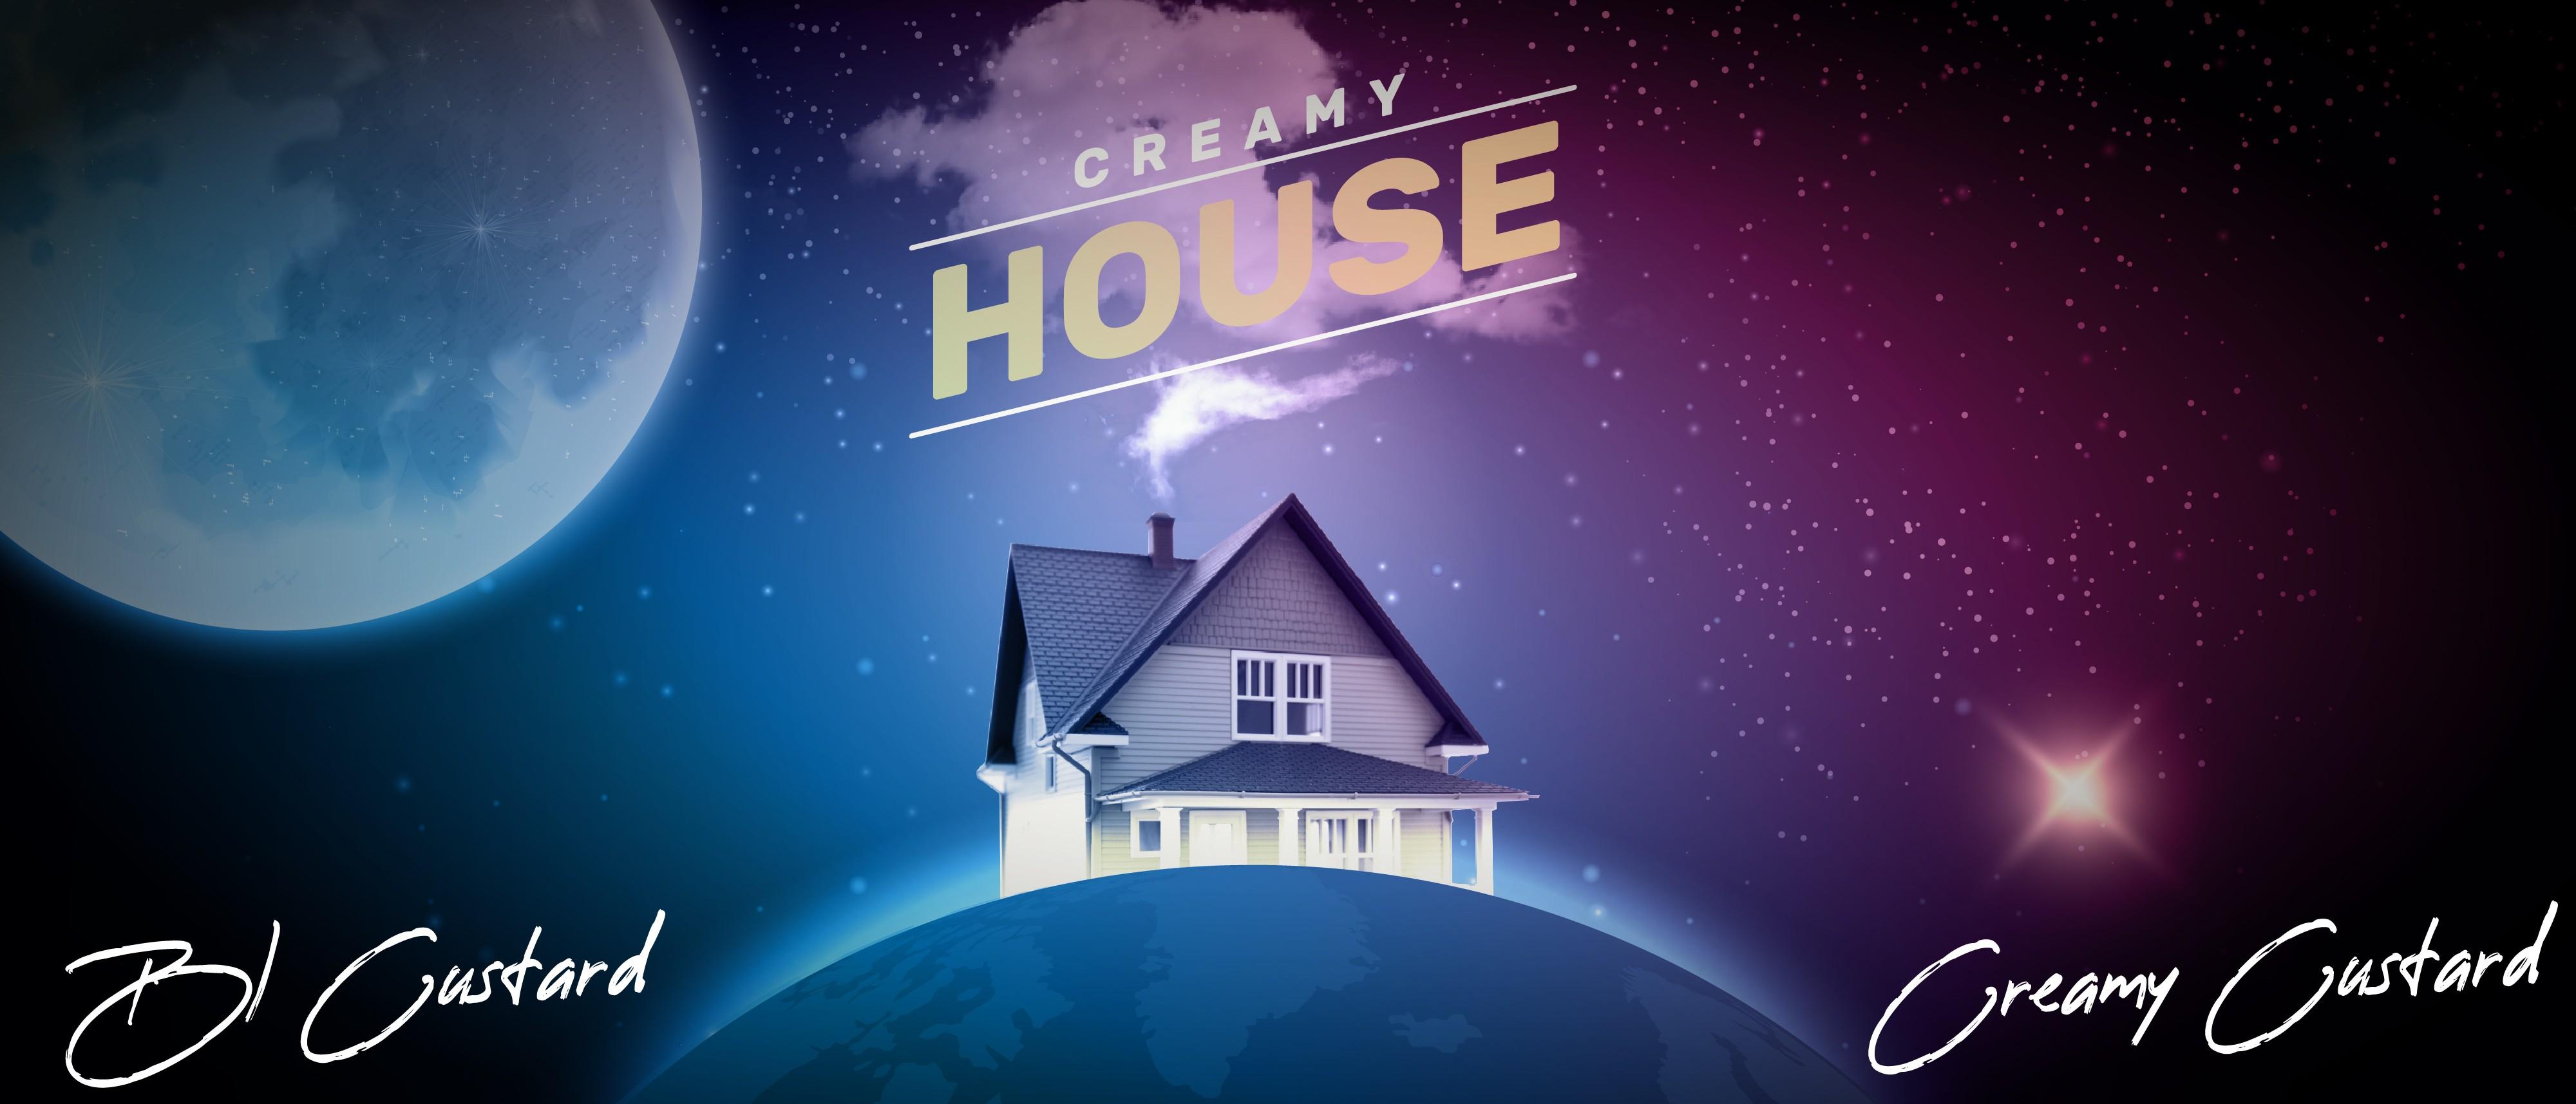 Creamy House